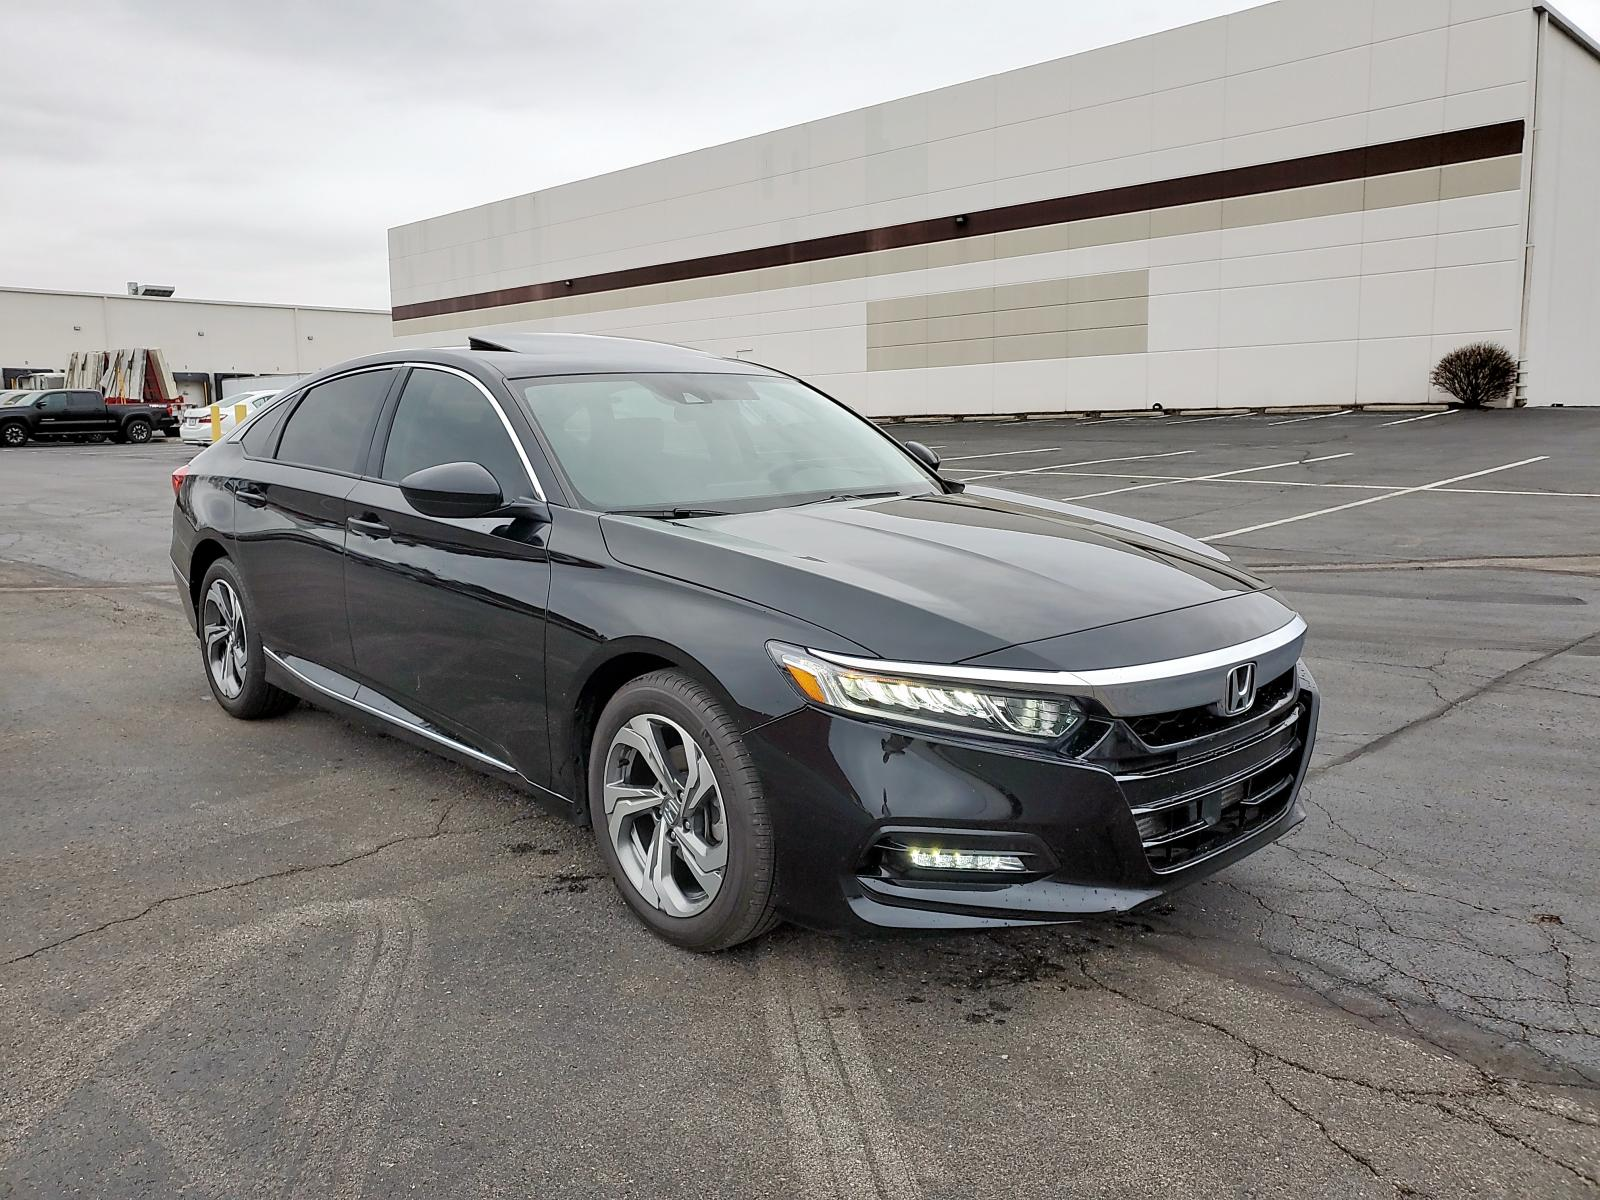 1HGCV1F46JA076138 - 2018 Honda Accord Ex 1.5L Left View